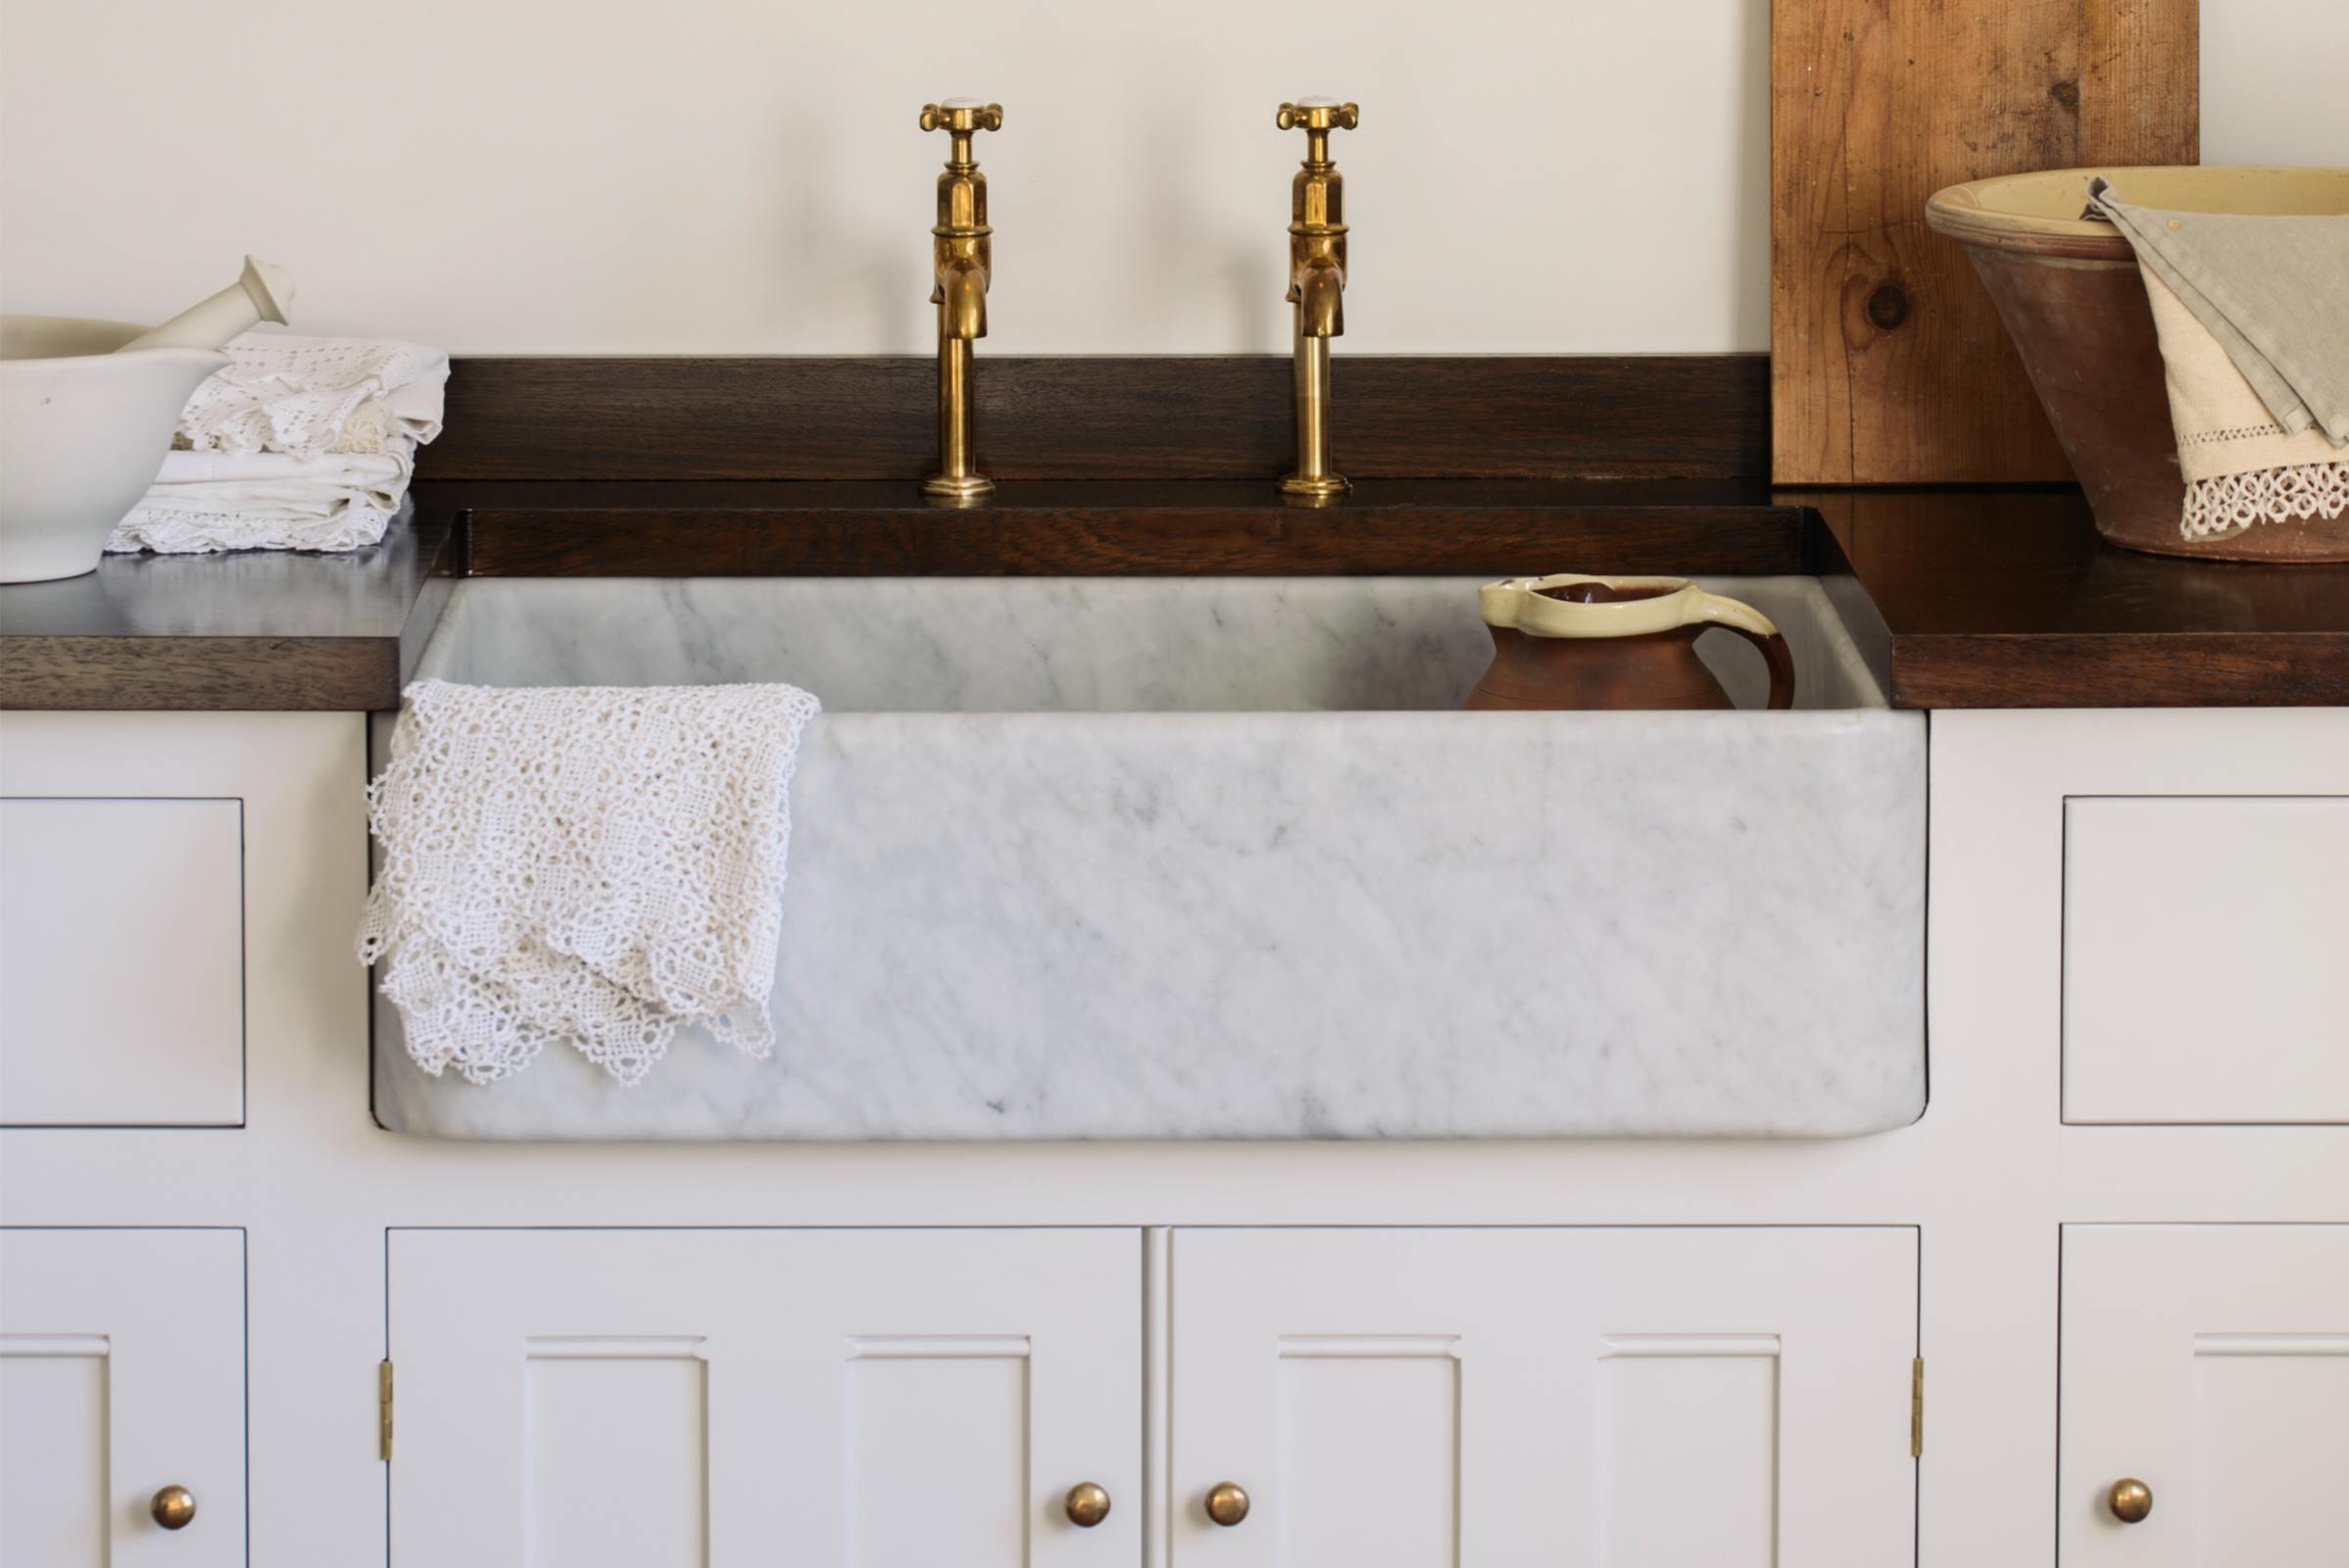 Tuscan Farmhouse 31 1/2'' Single Marble Sink photo 5